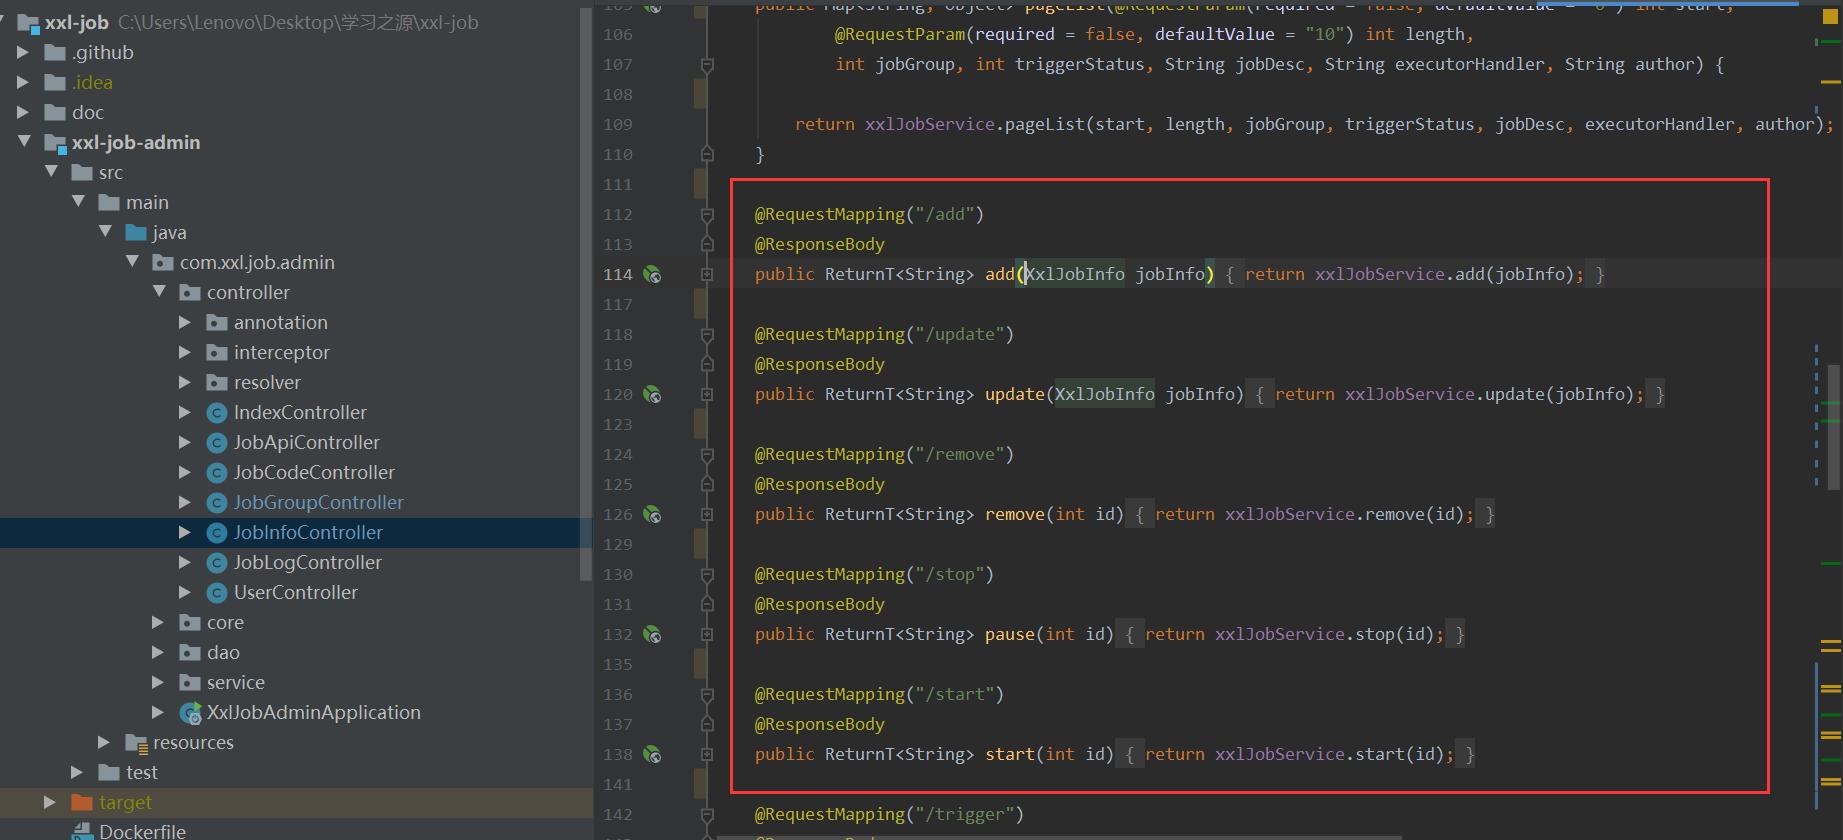 xxl-job-interface